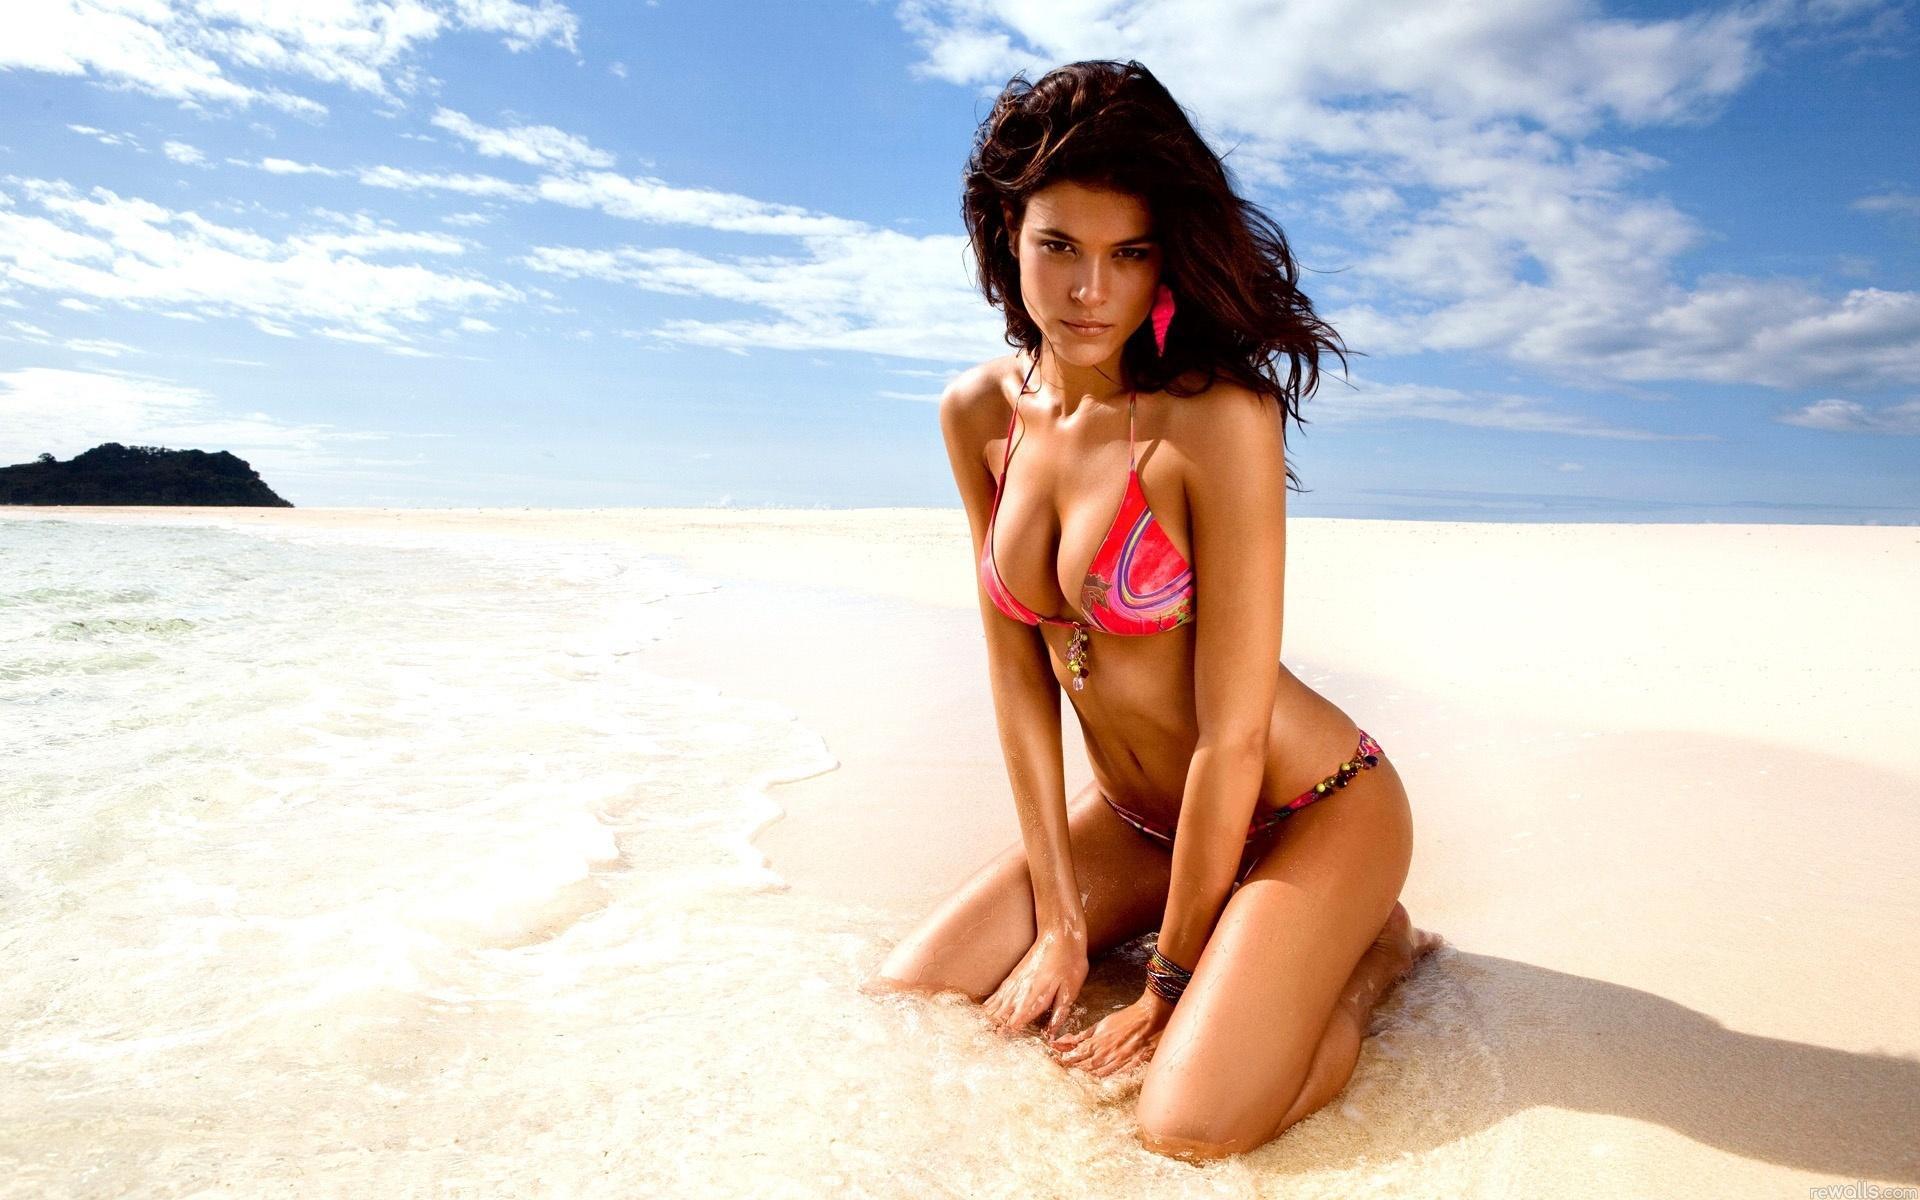 Позы на фото для пляжей